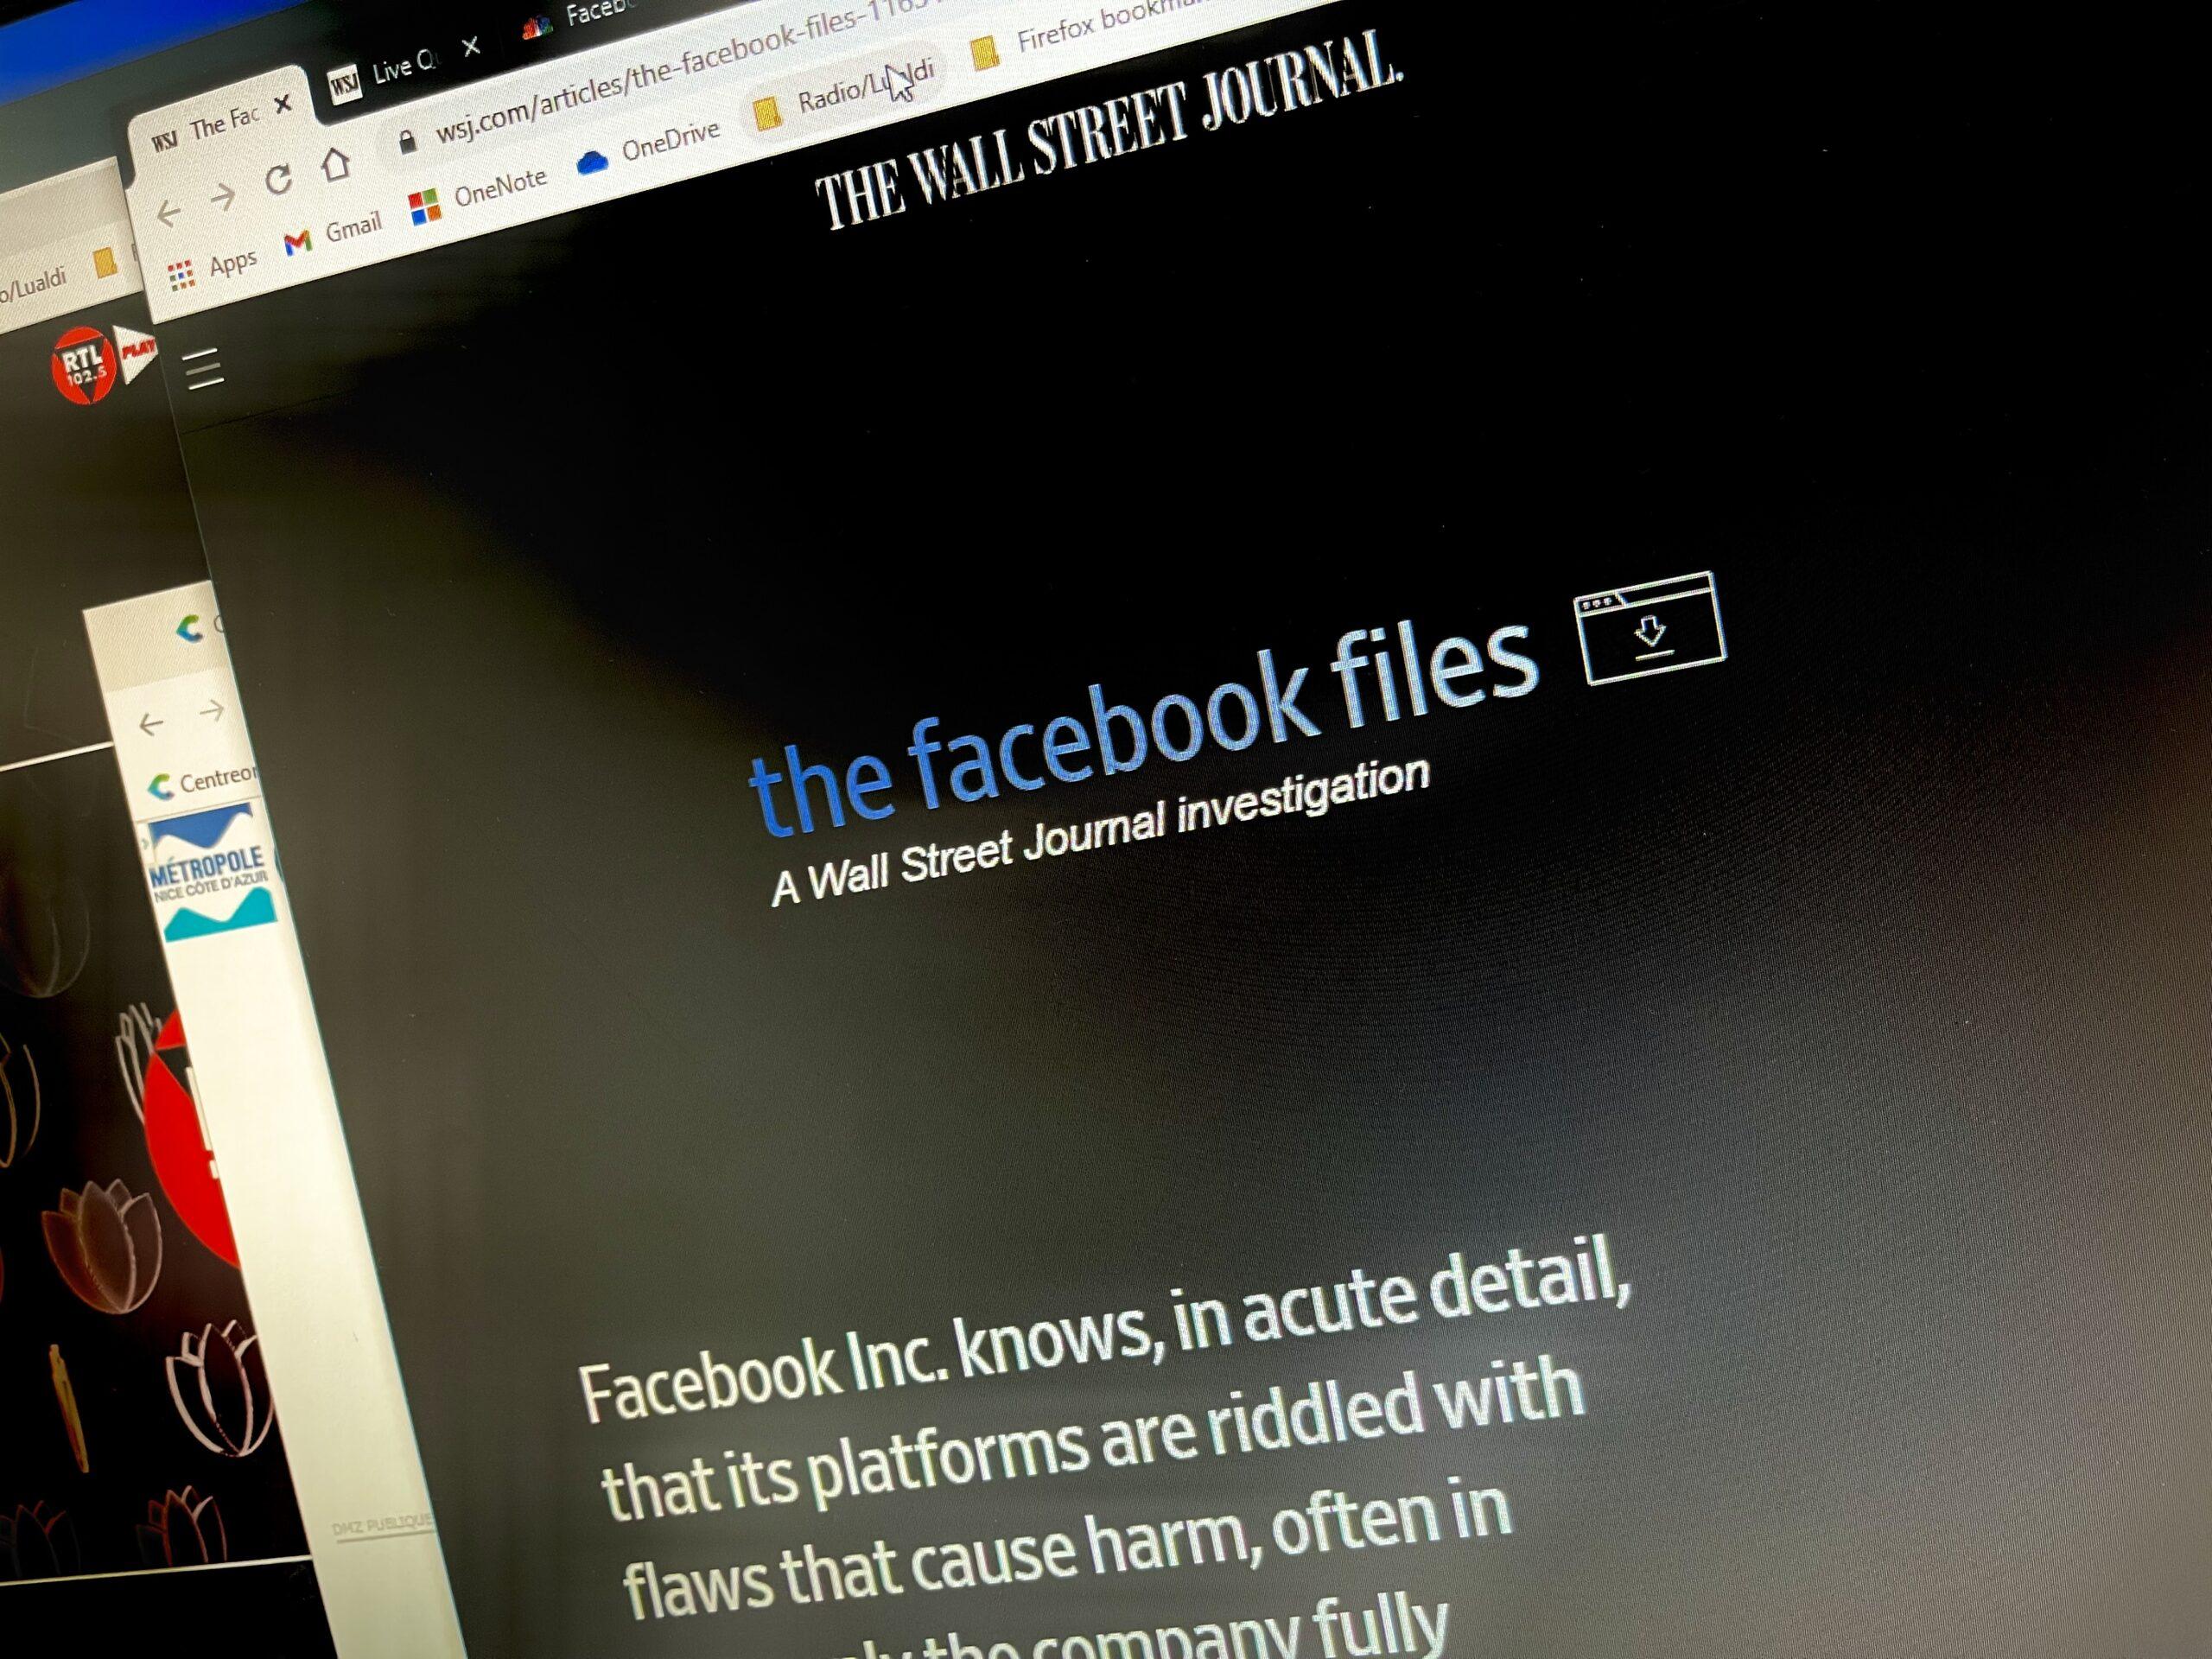 facebook files, wsj